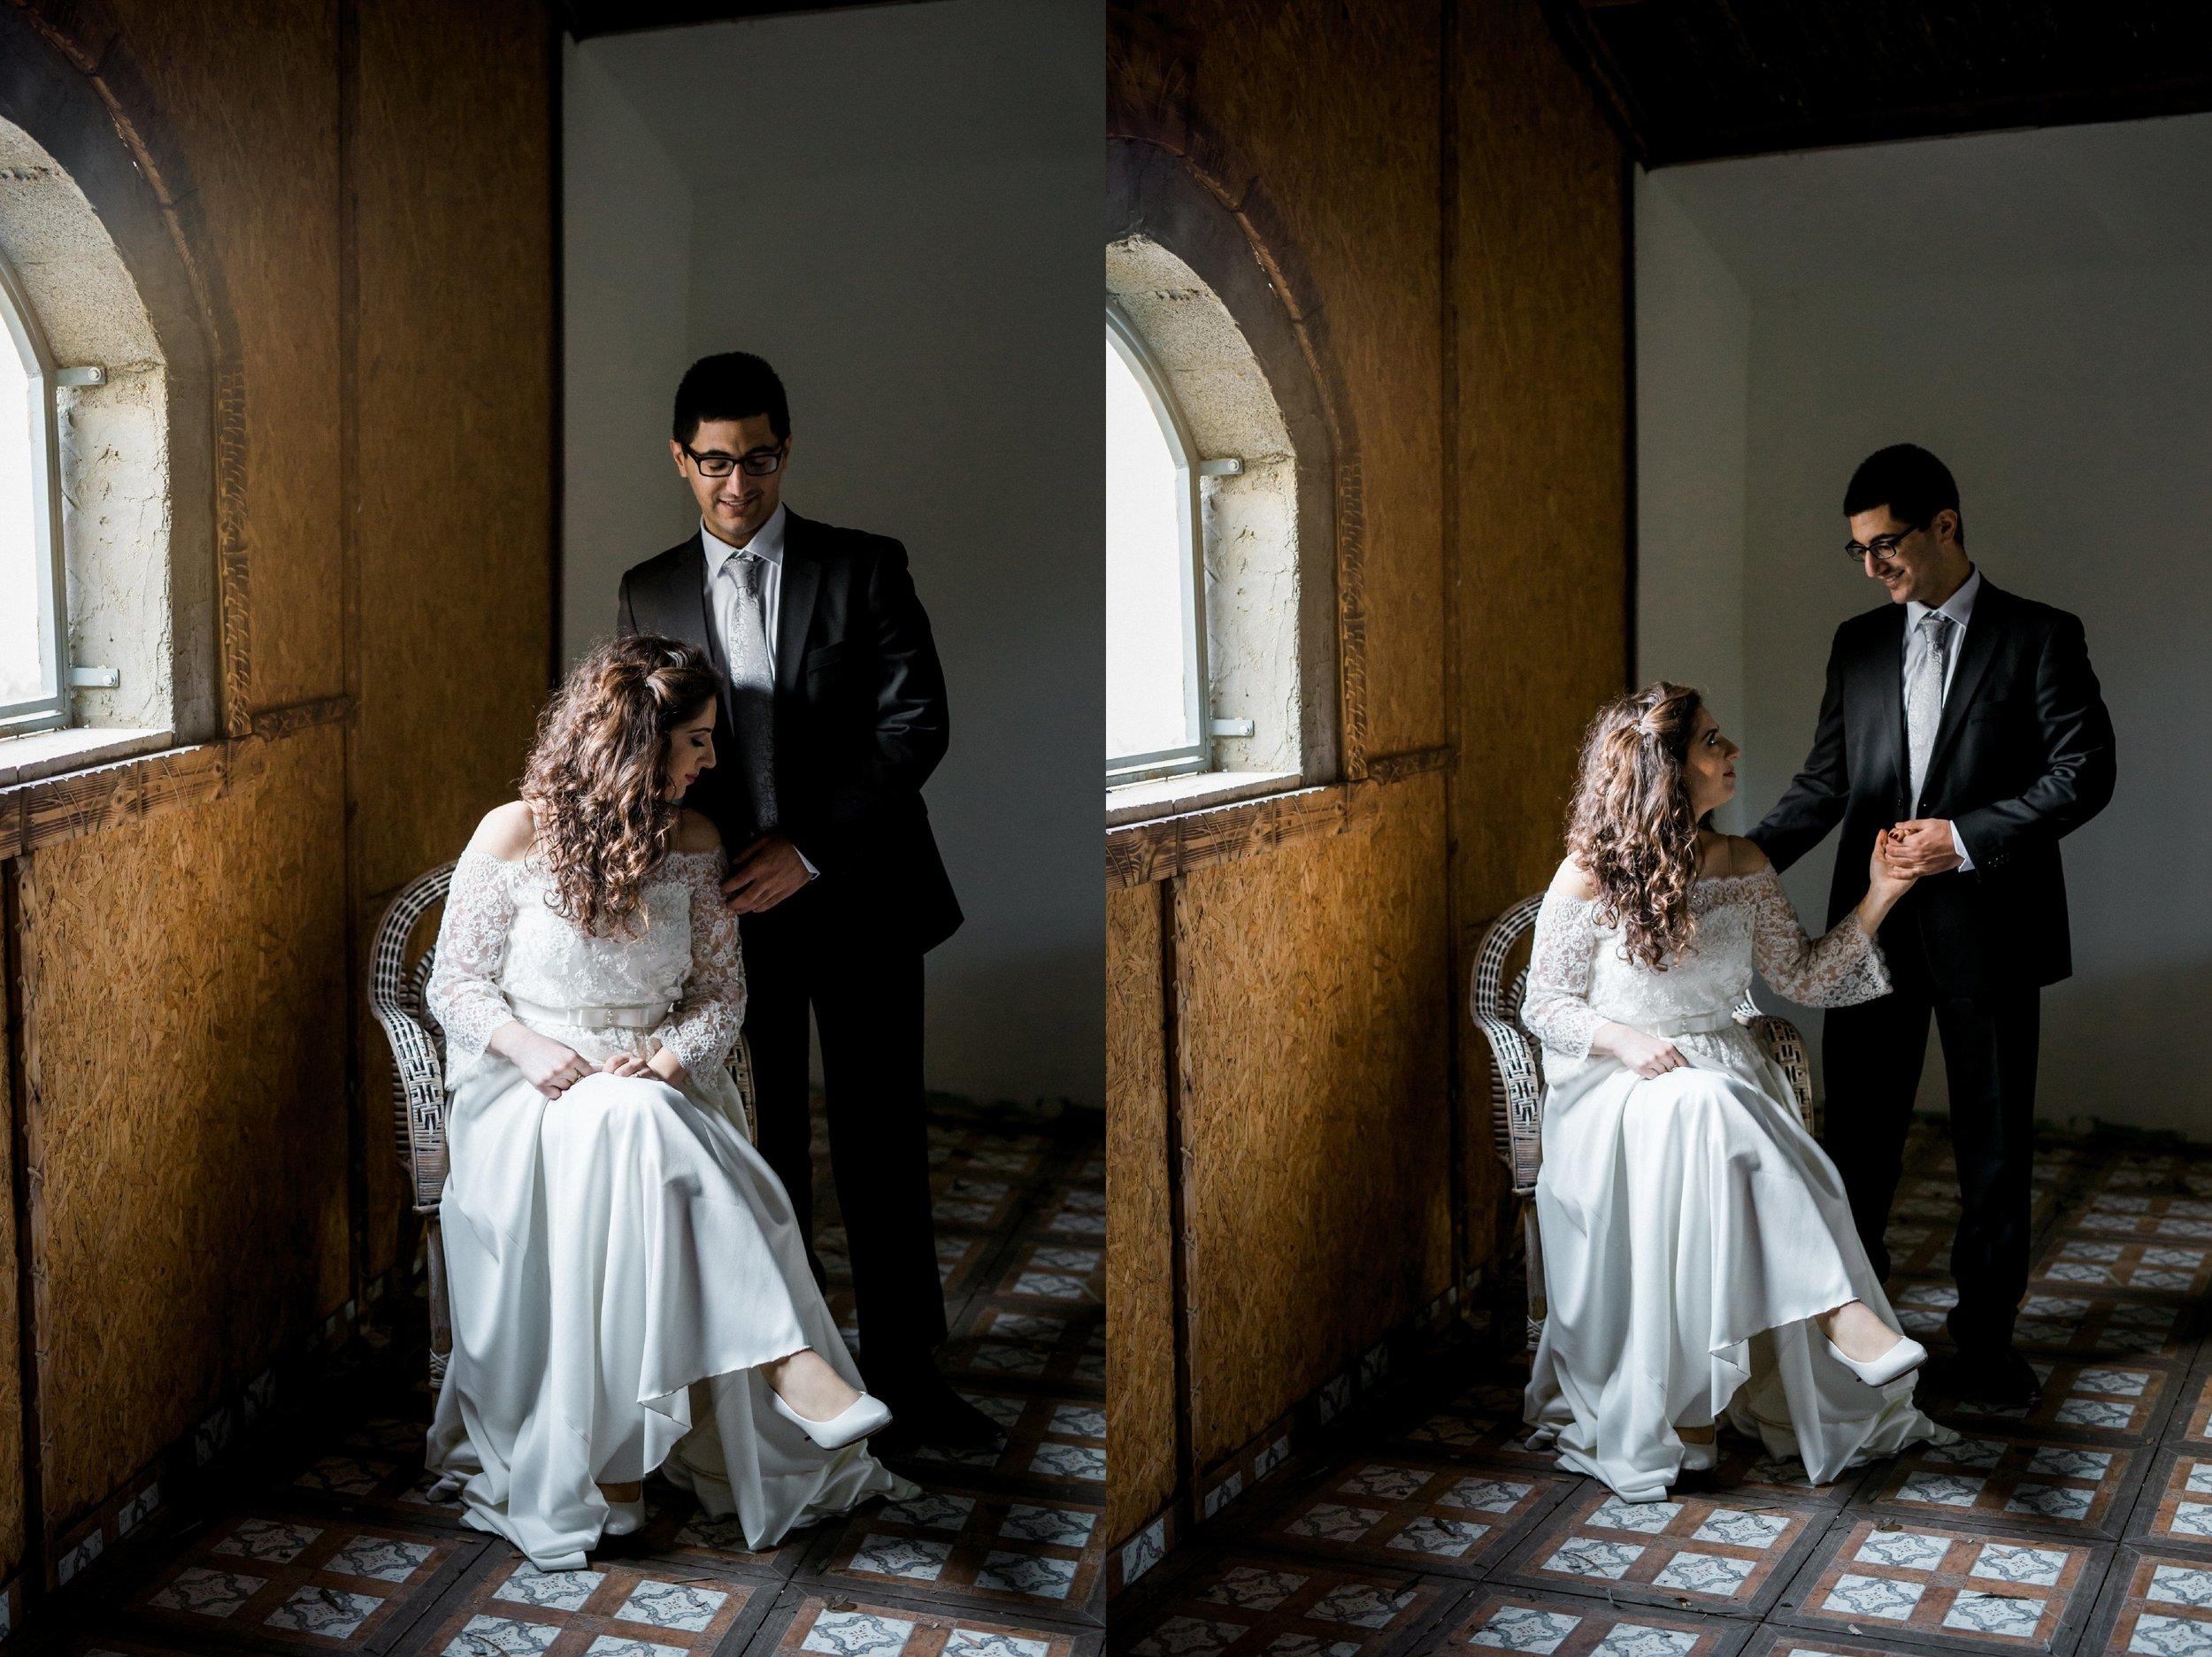 israel-garden-wedding-portraits-session-kate-giryes-photography--43_WEB.jpg